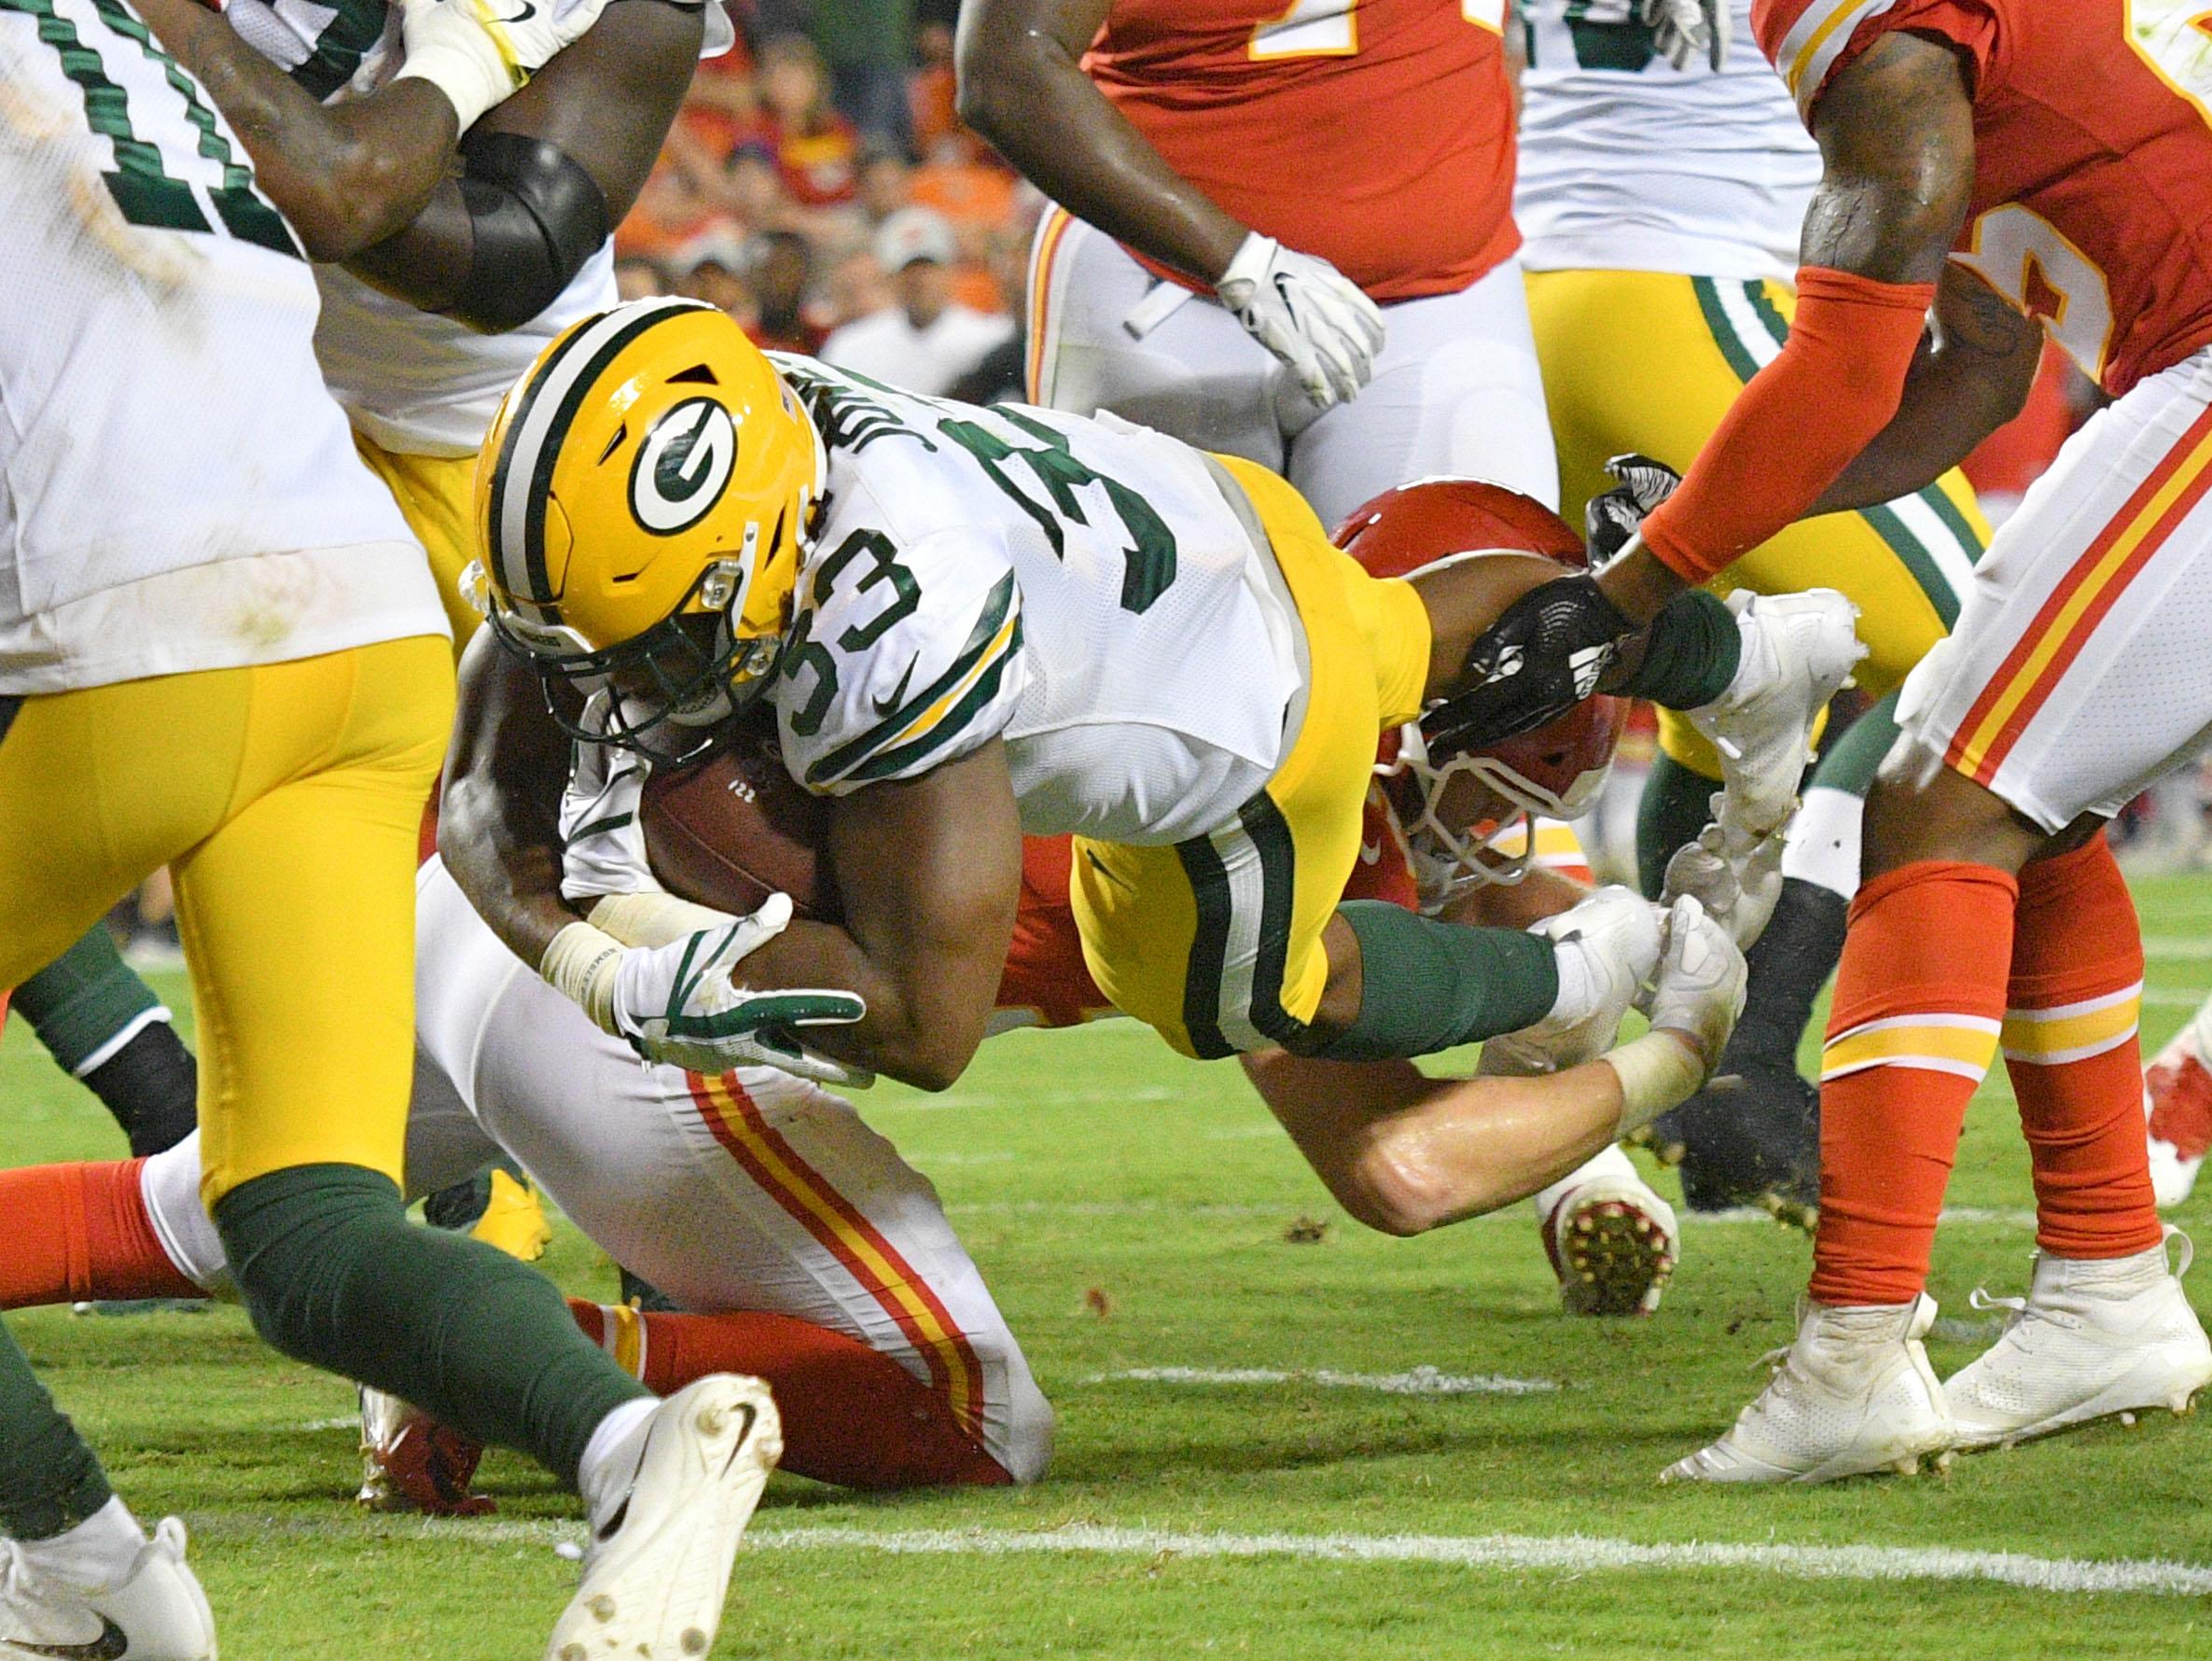 NFL: Green Bay Packers at Kansas City Chiefs